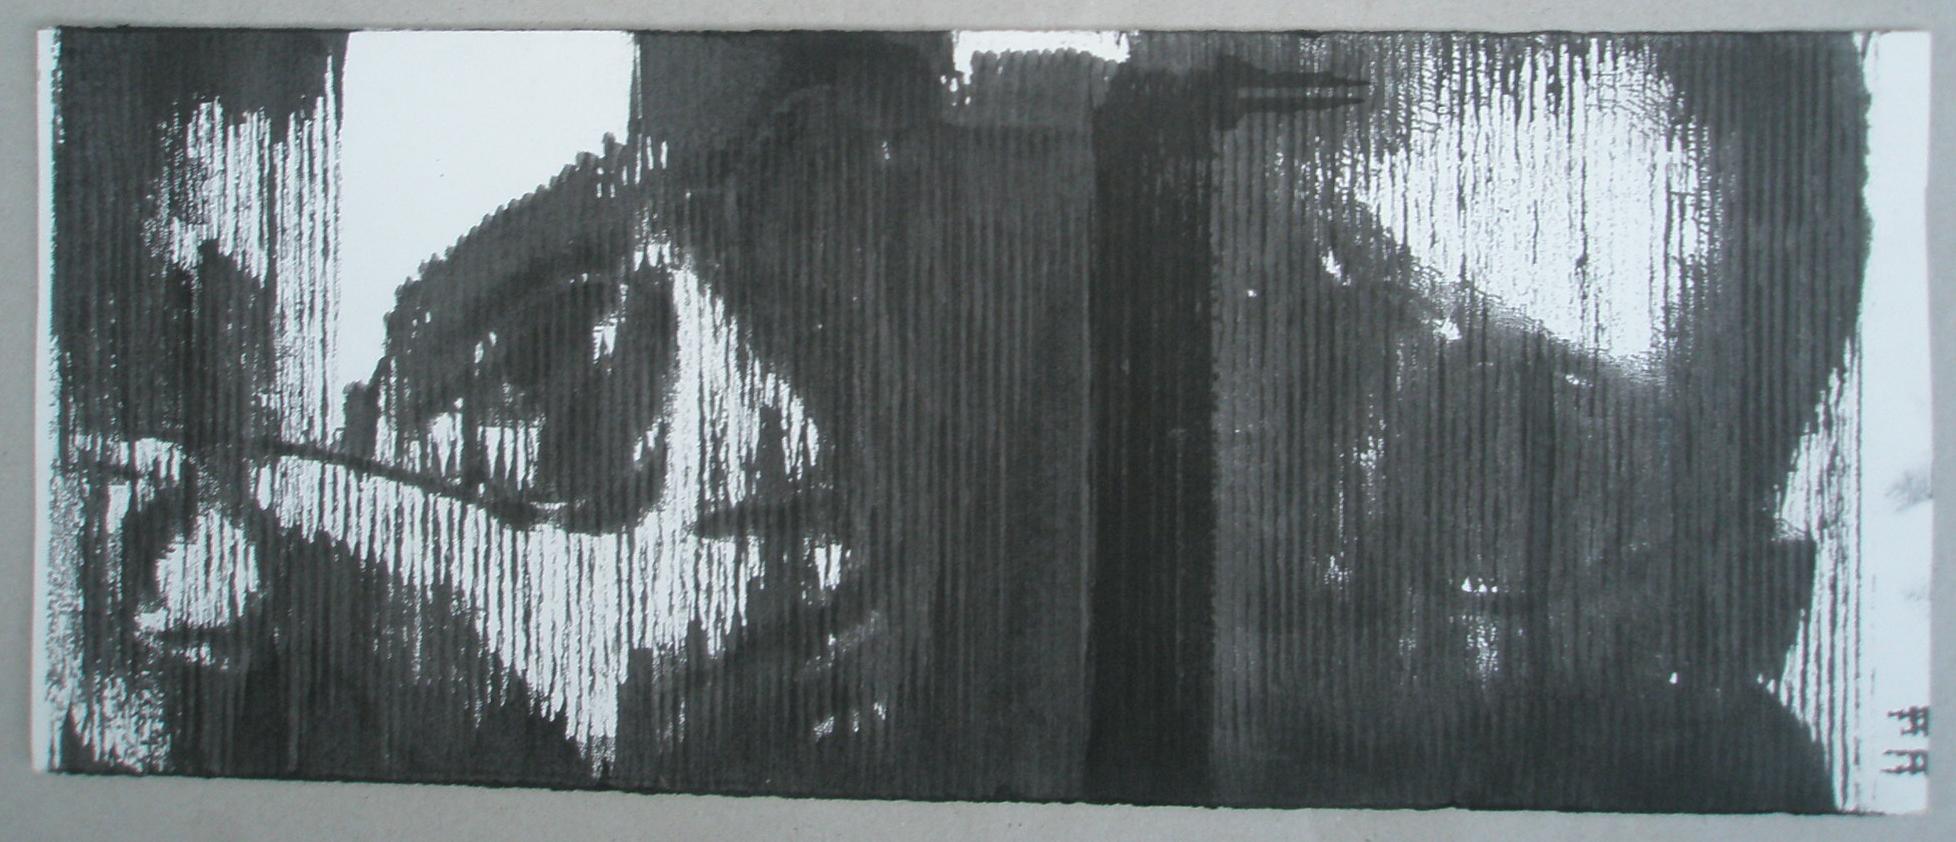 self portraits [1992] print on paper  I kind of hacked